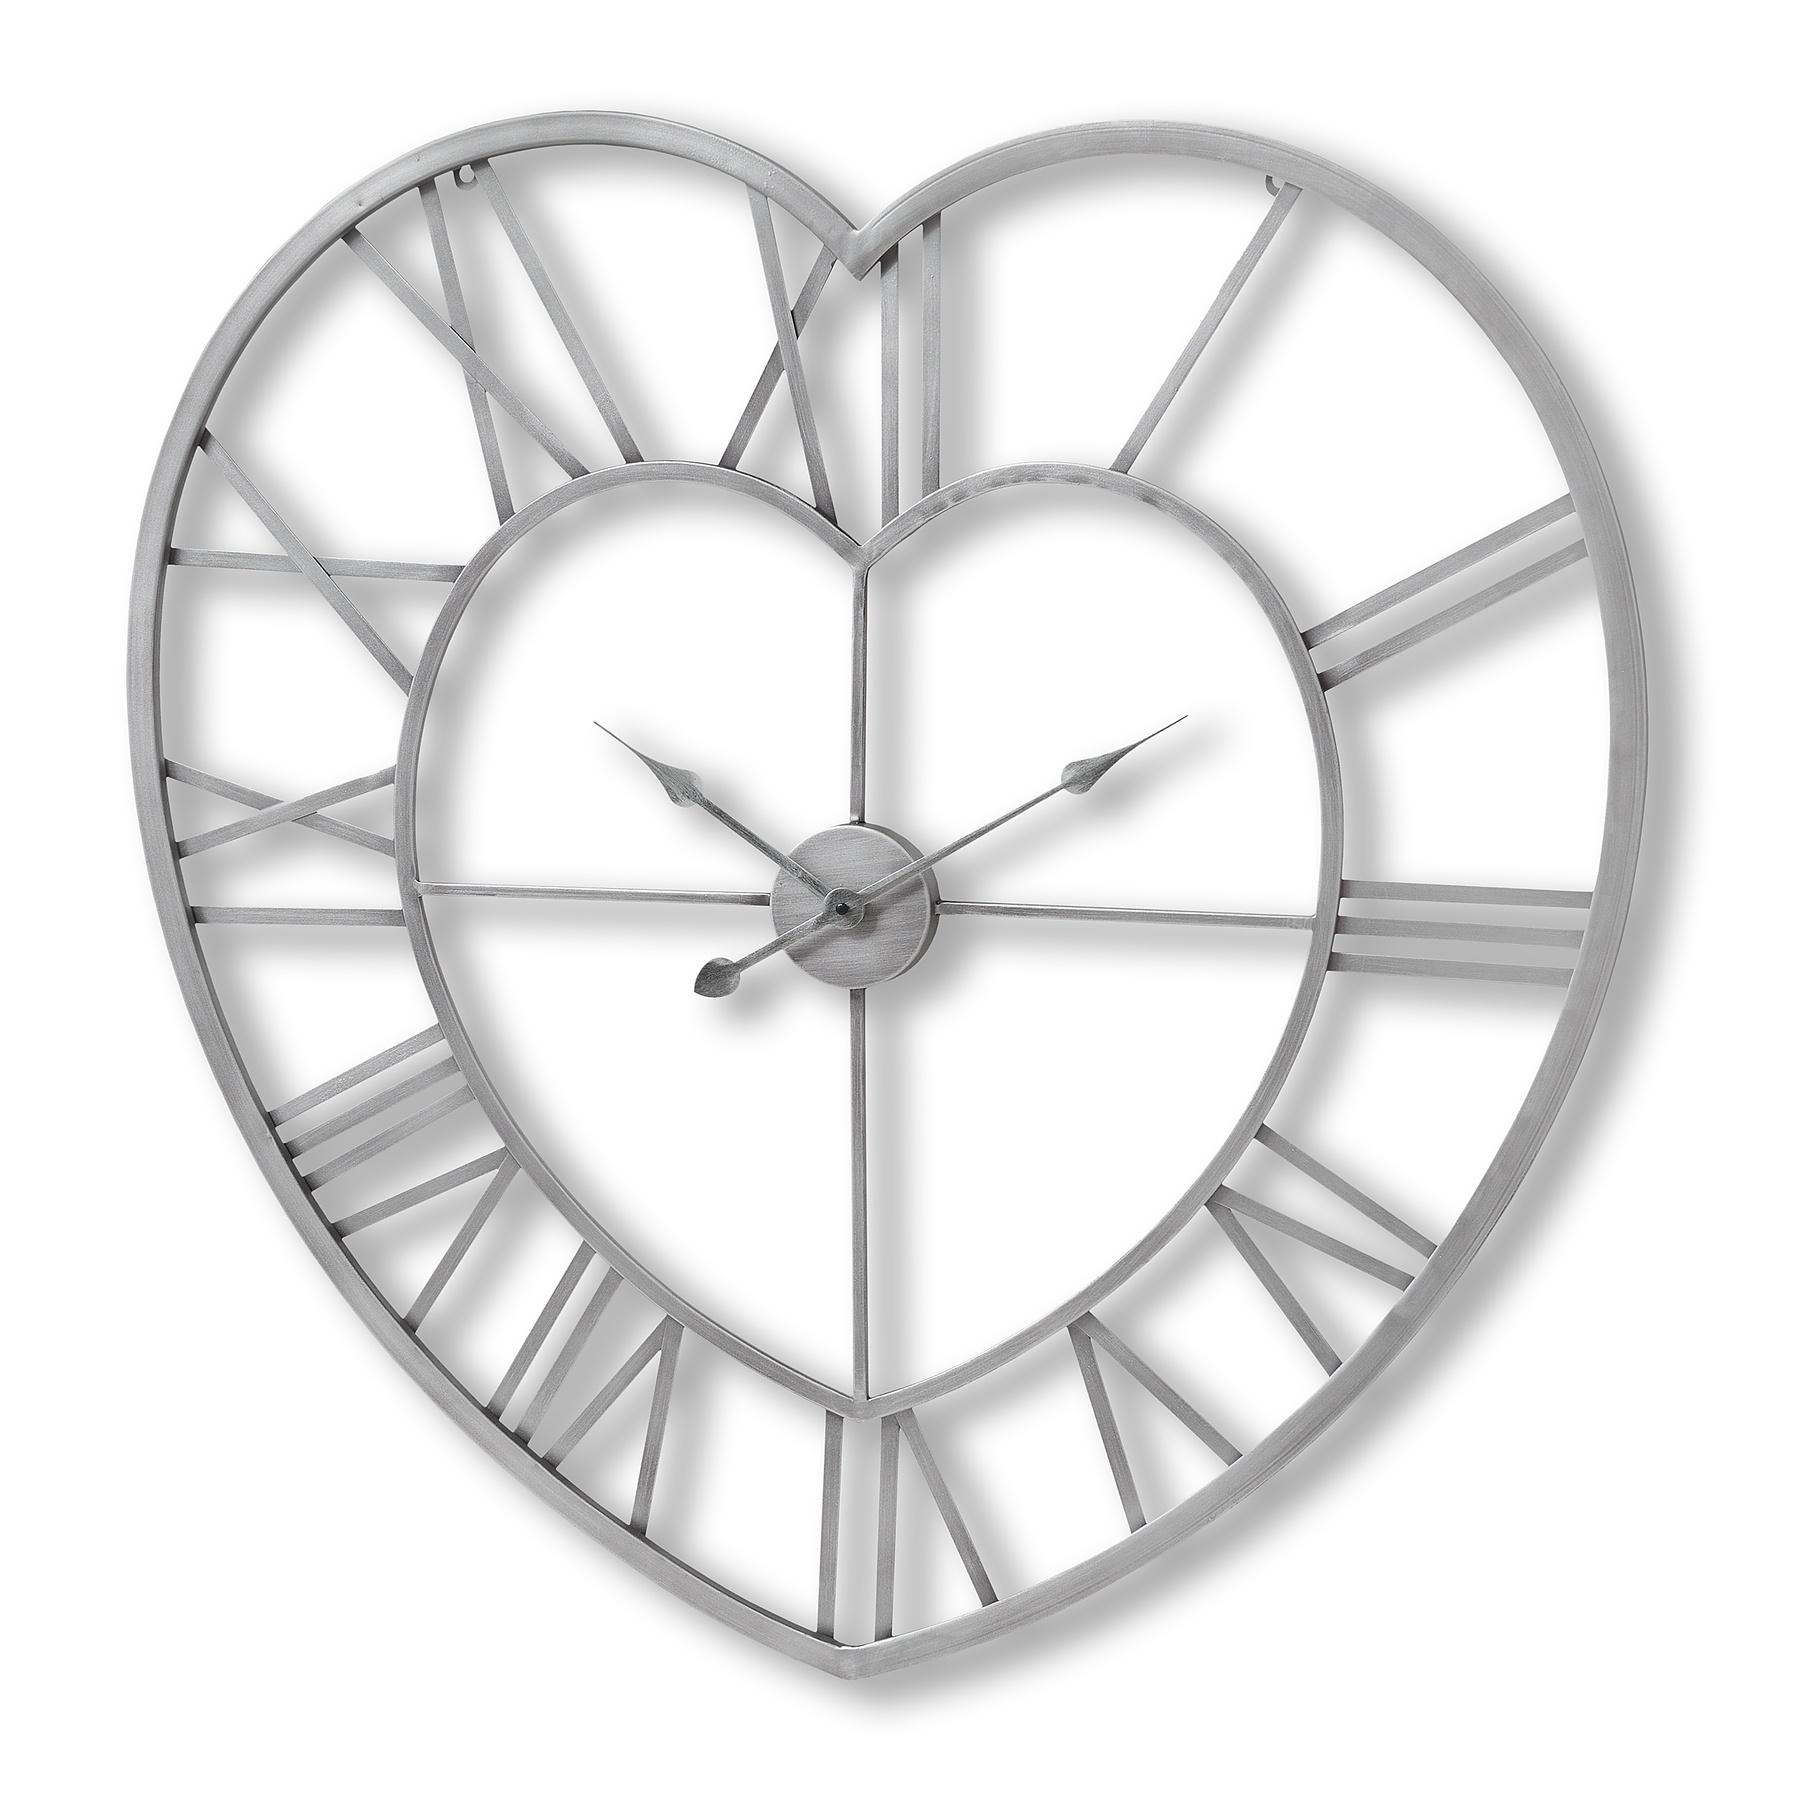 Silver Heart Skeleton Wall Clock - Image 1